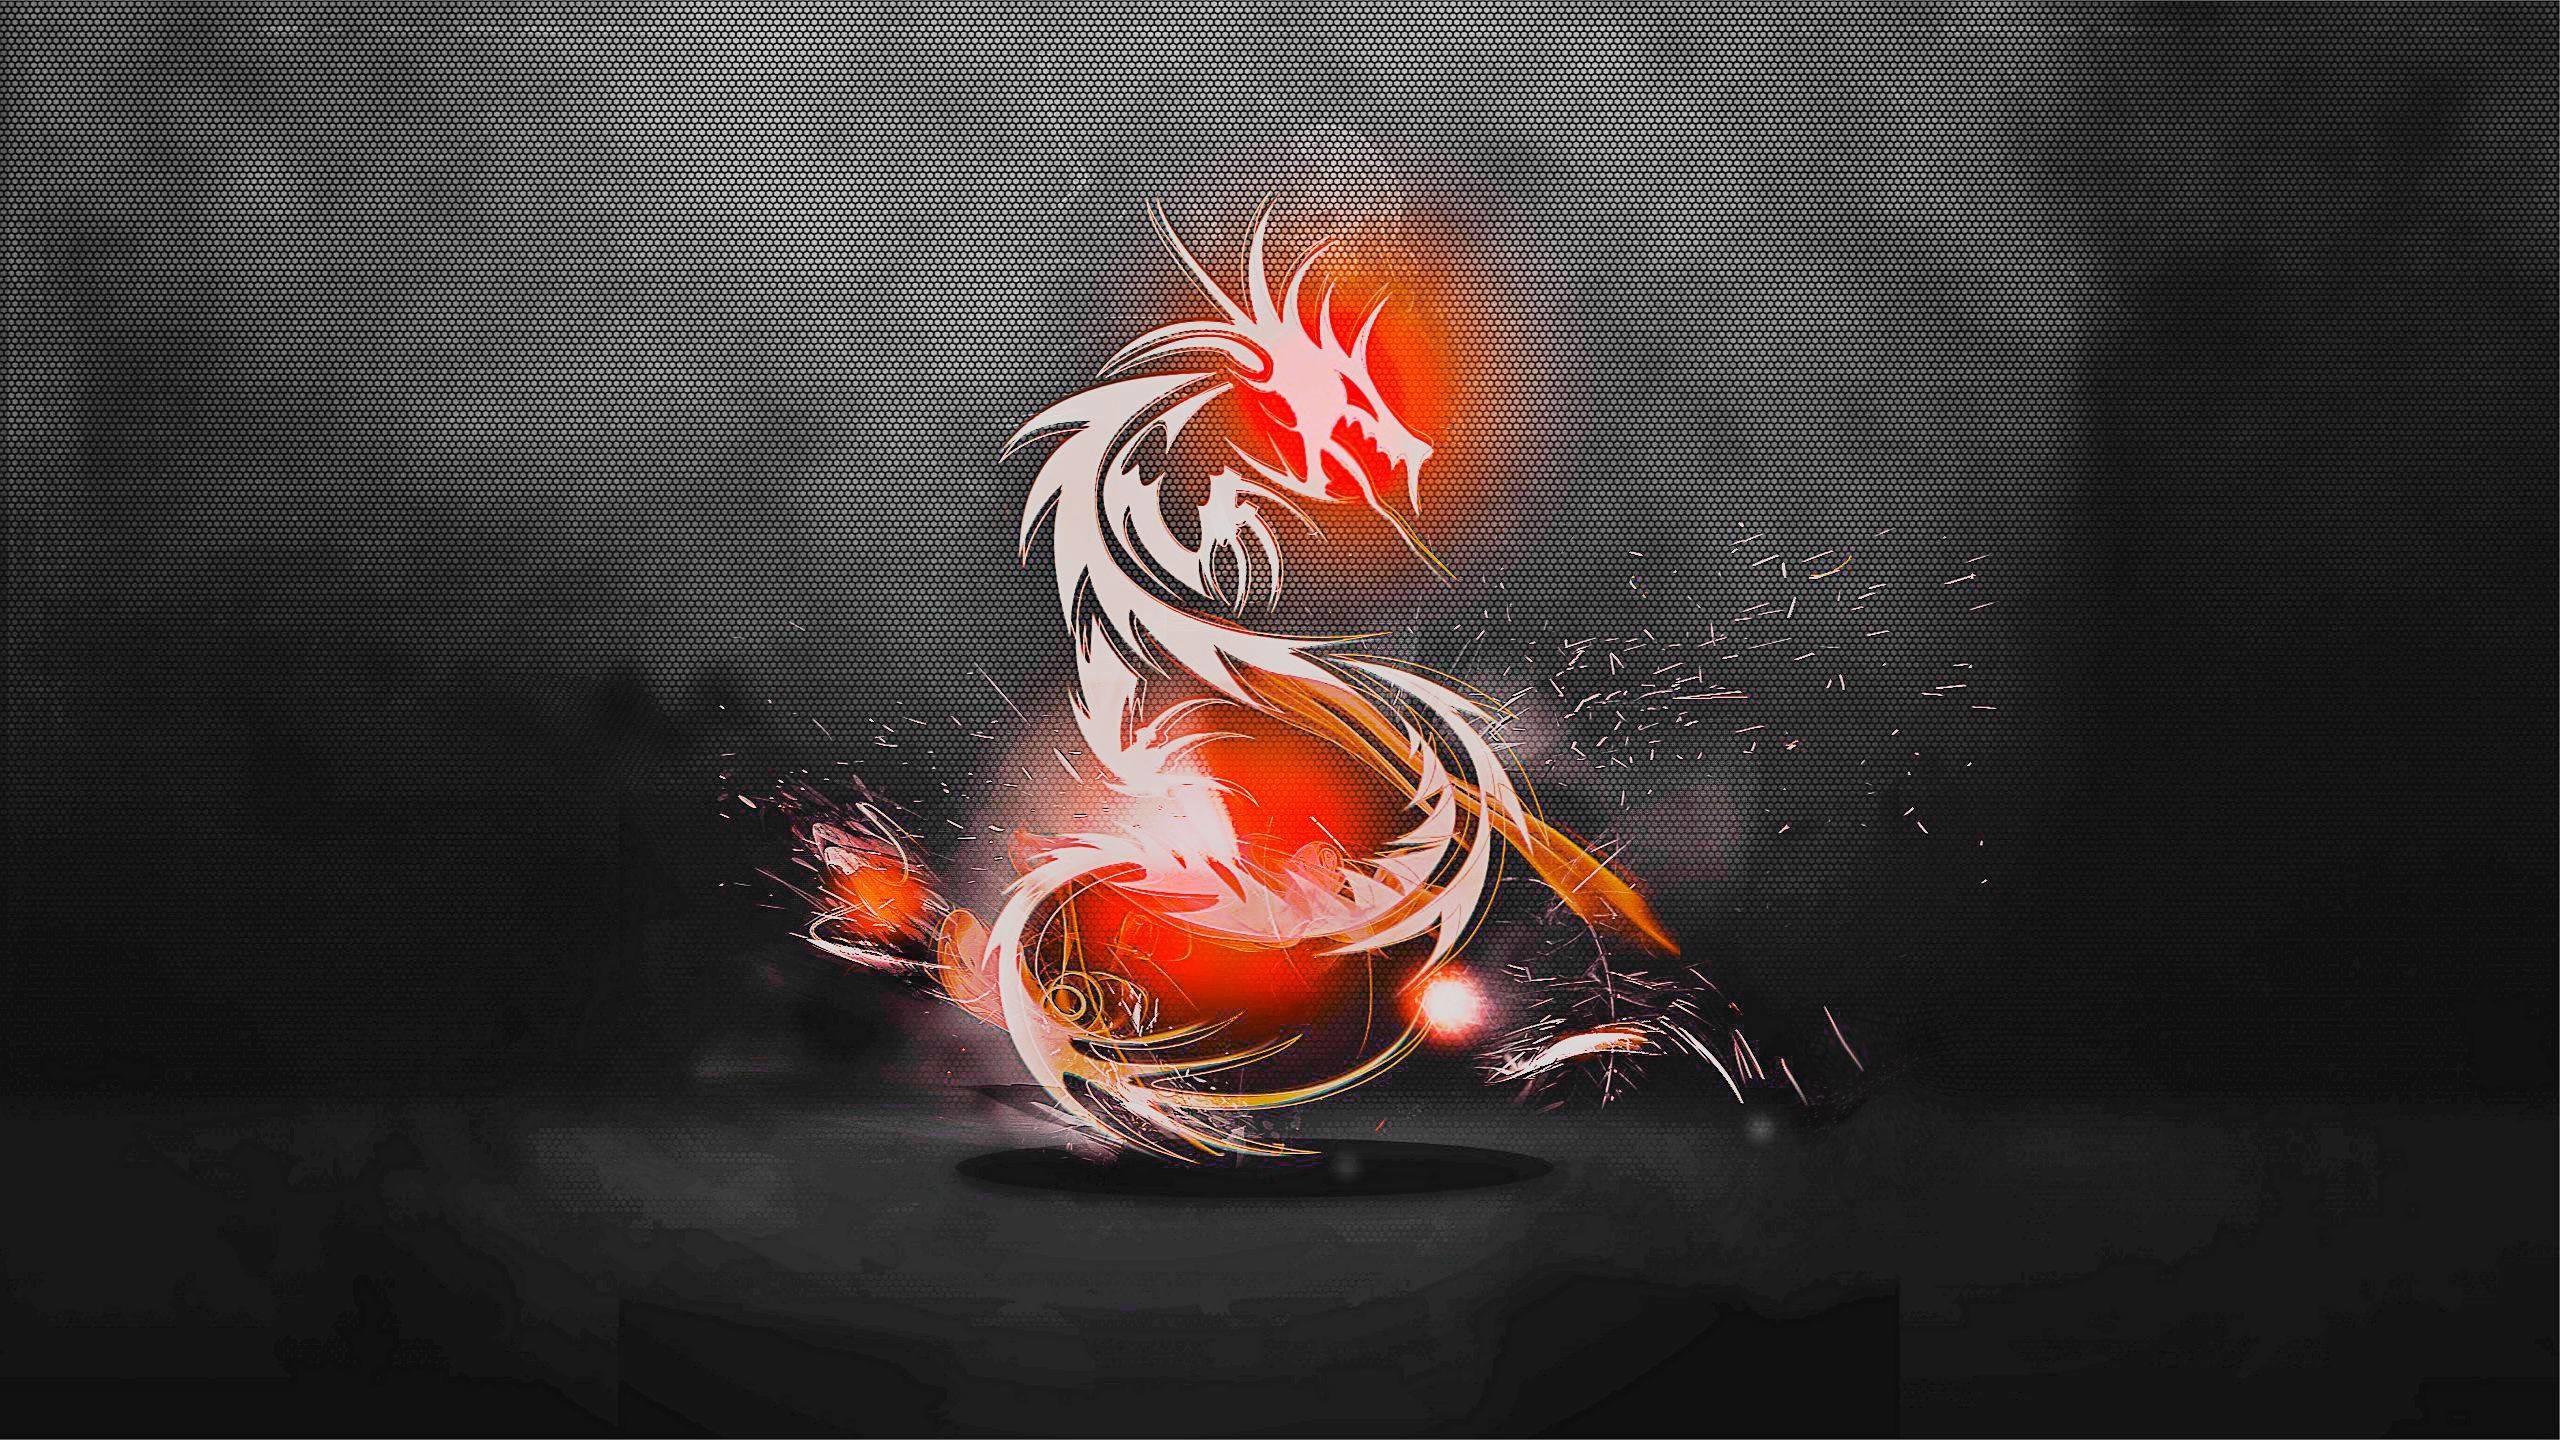 Red Dragon Wallpaper | Wallpaper Color